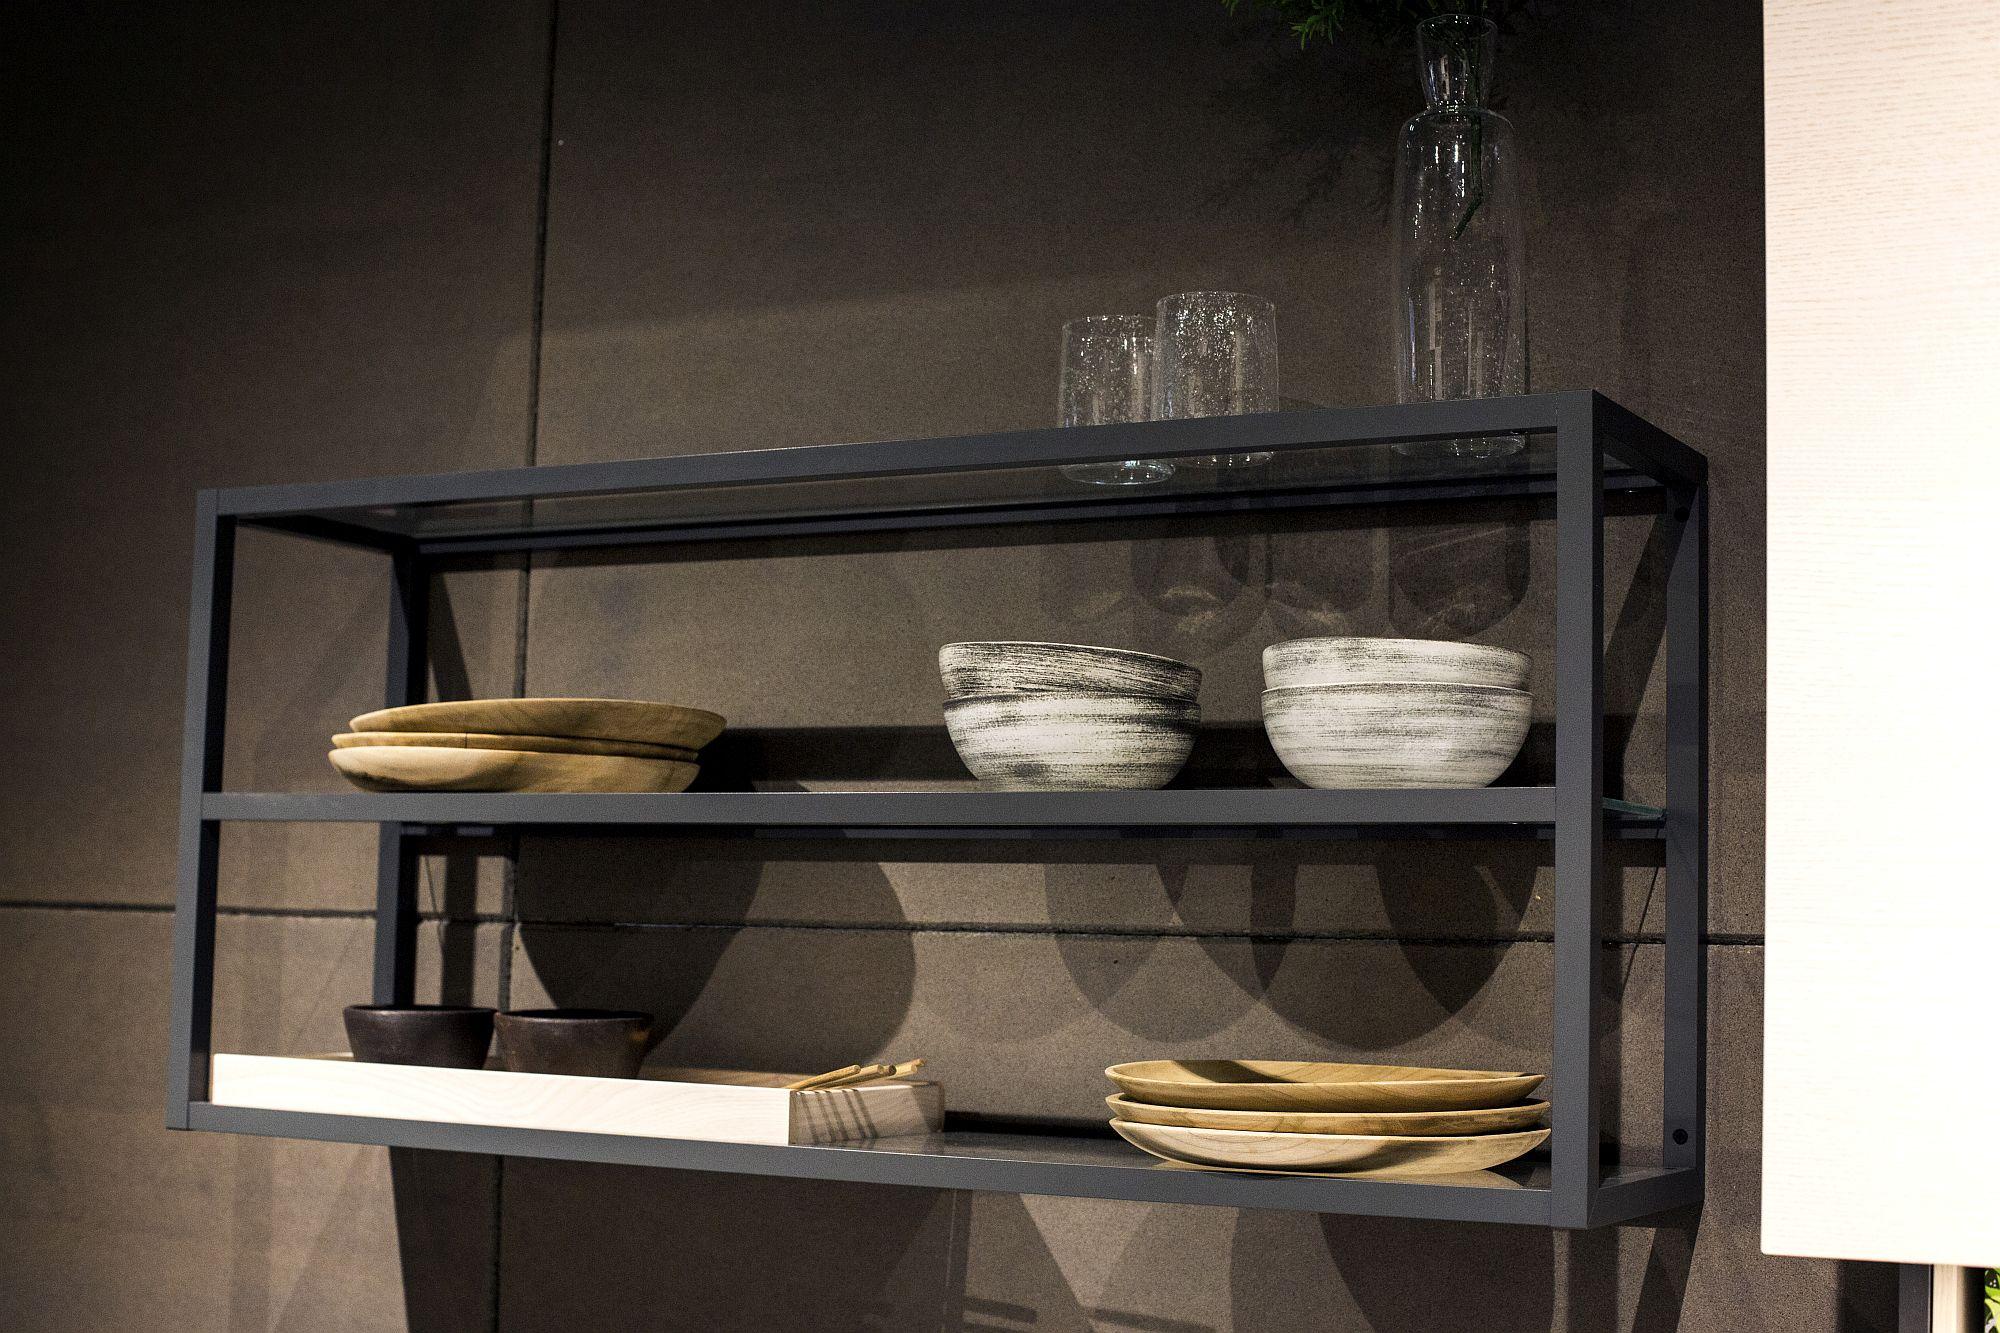 Glass and metal floating shelf unit